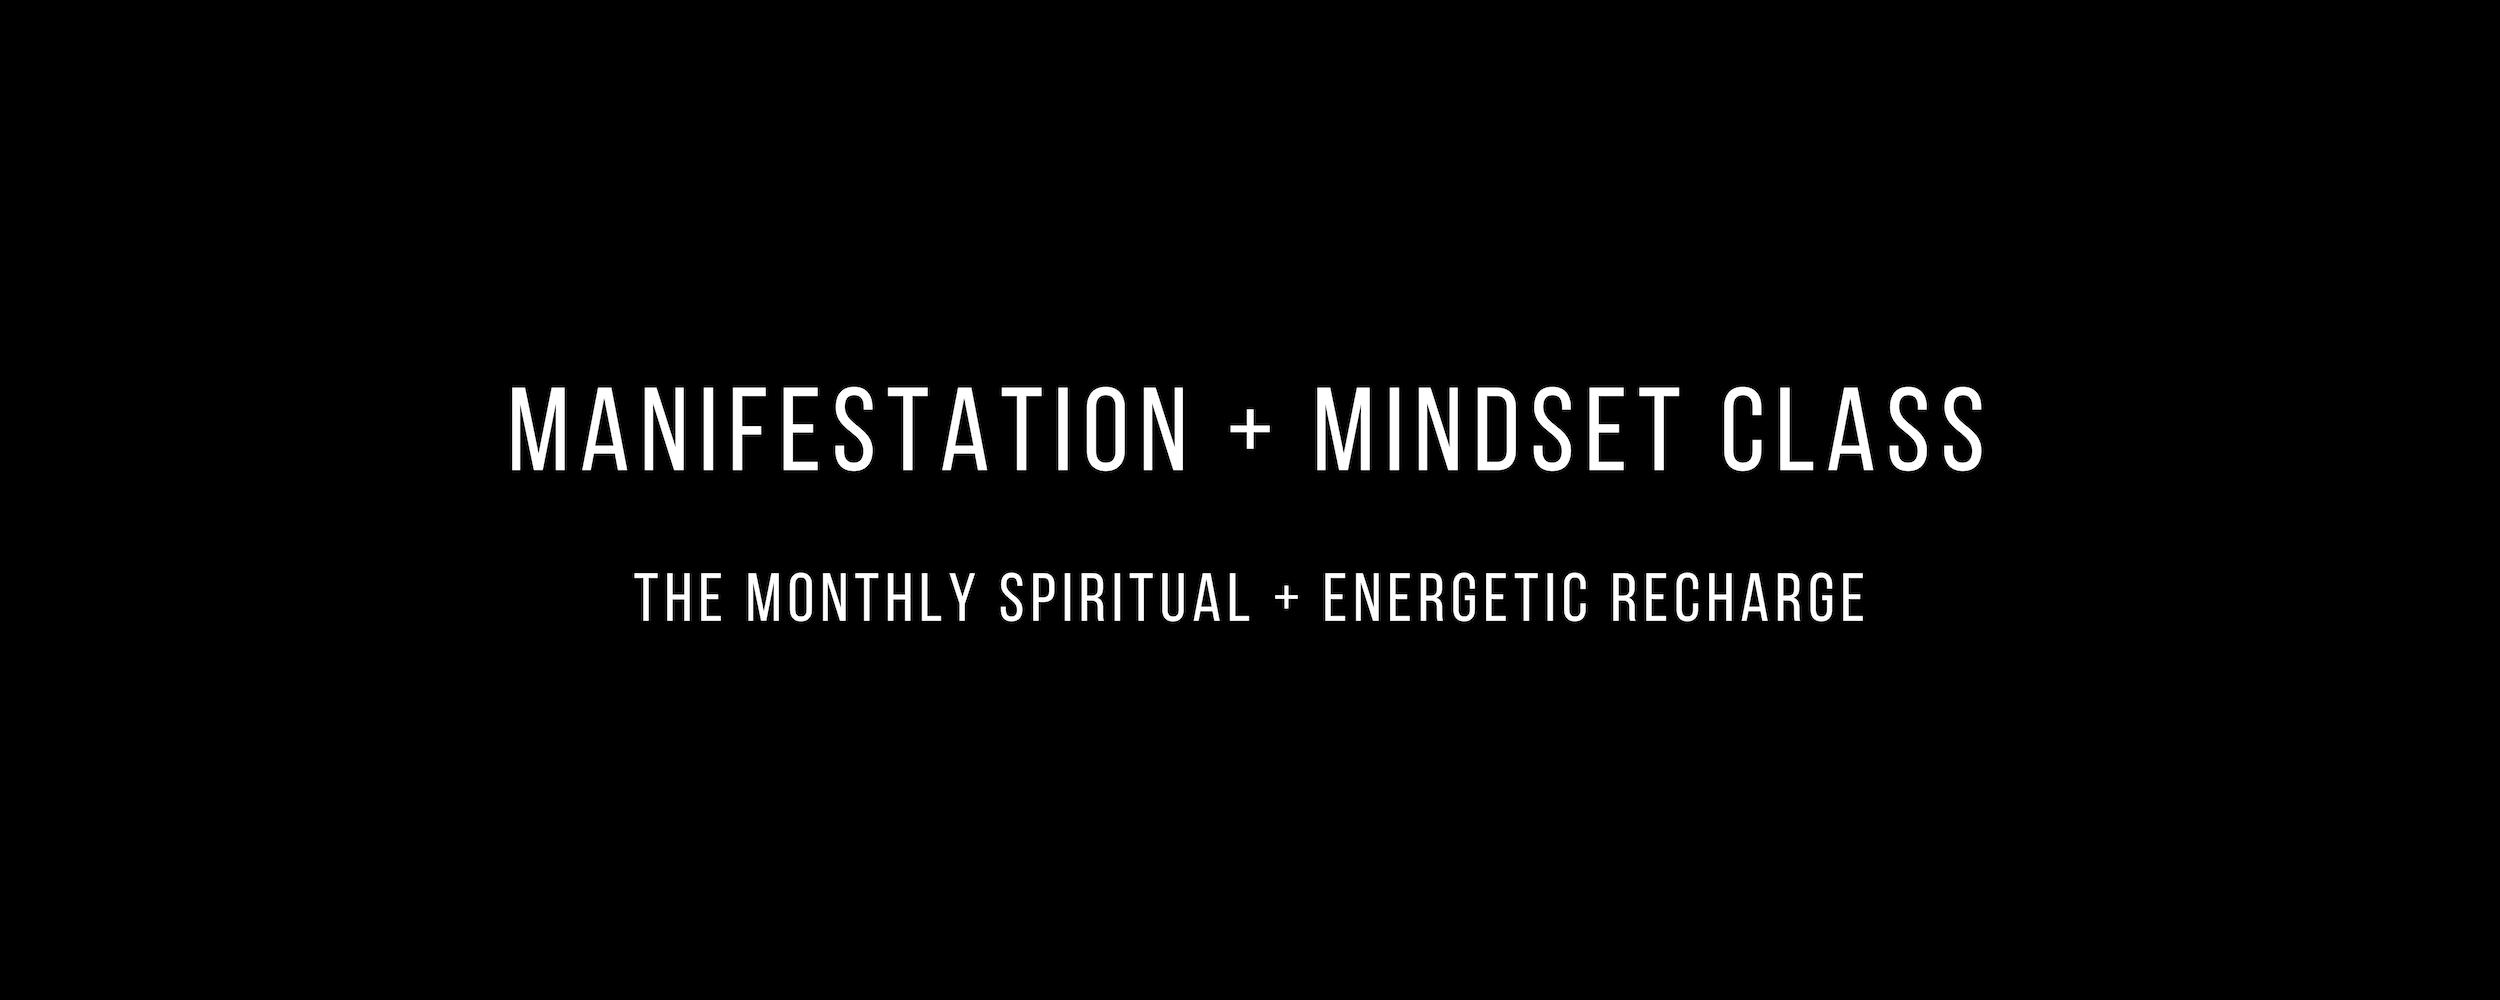 manifestation + mindset class